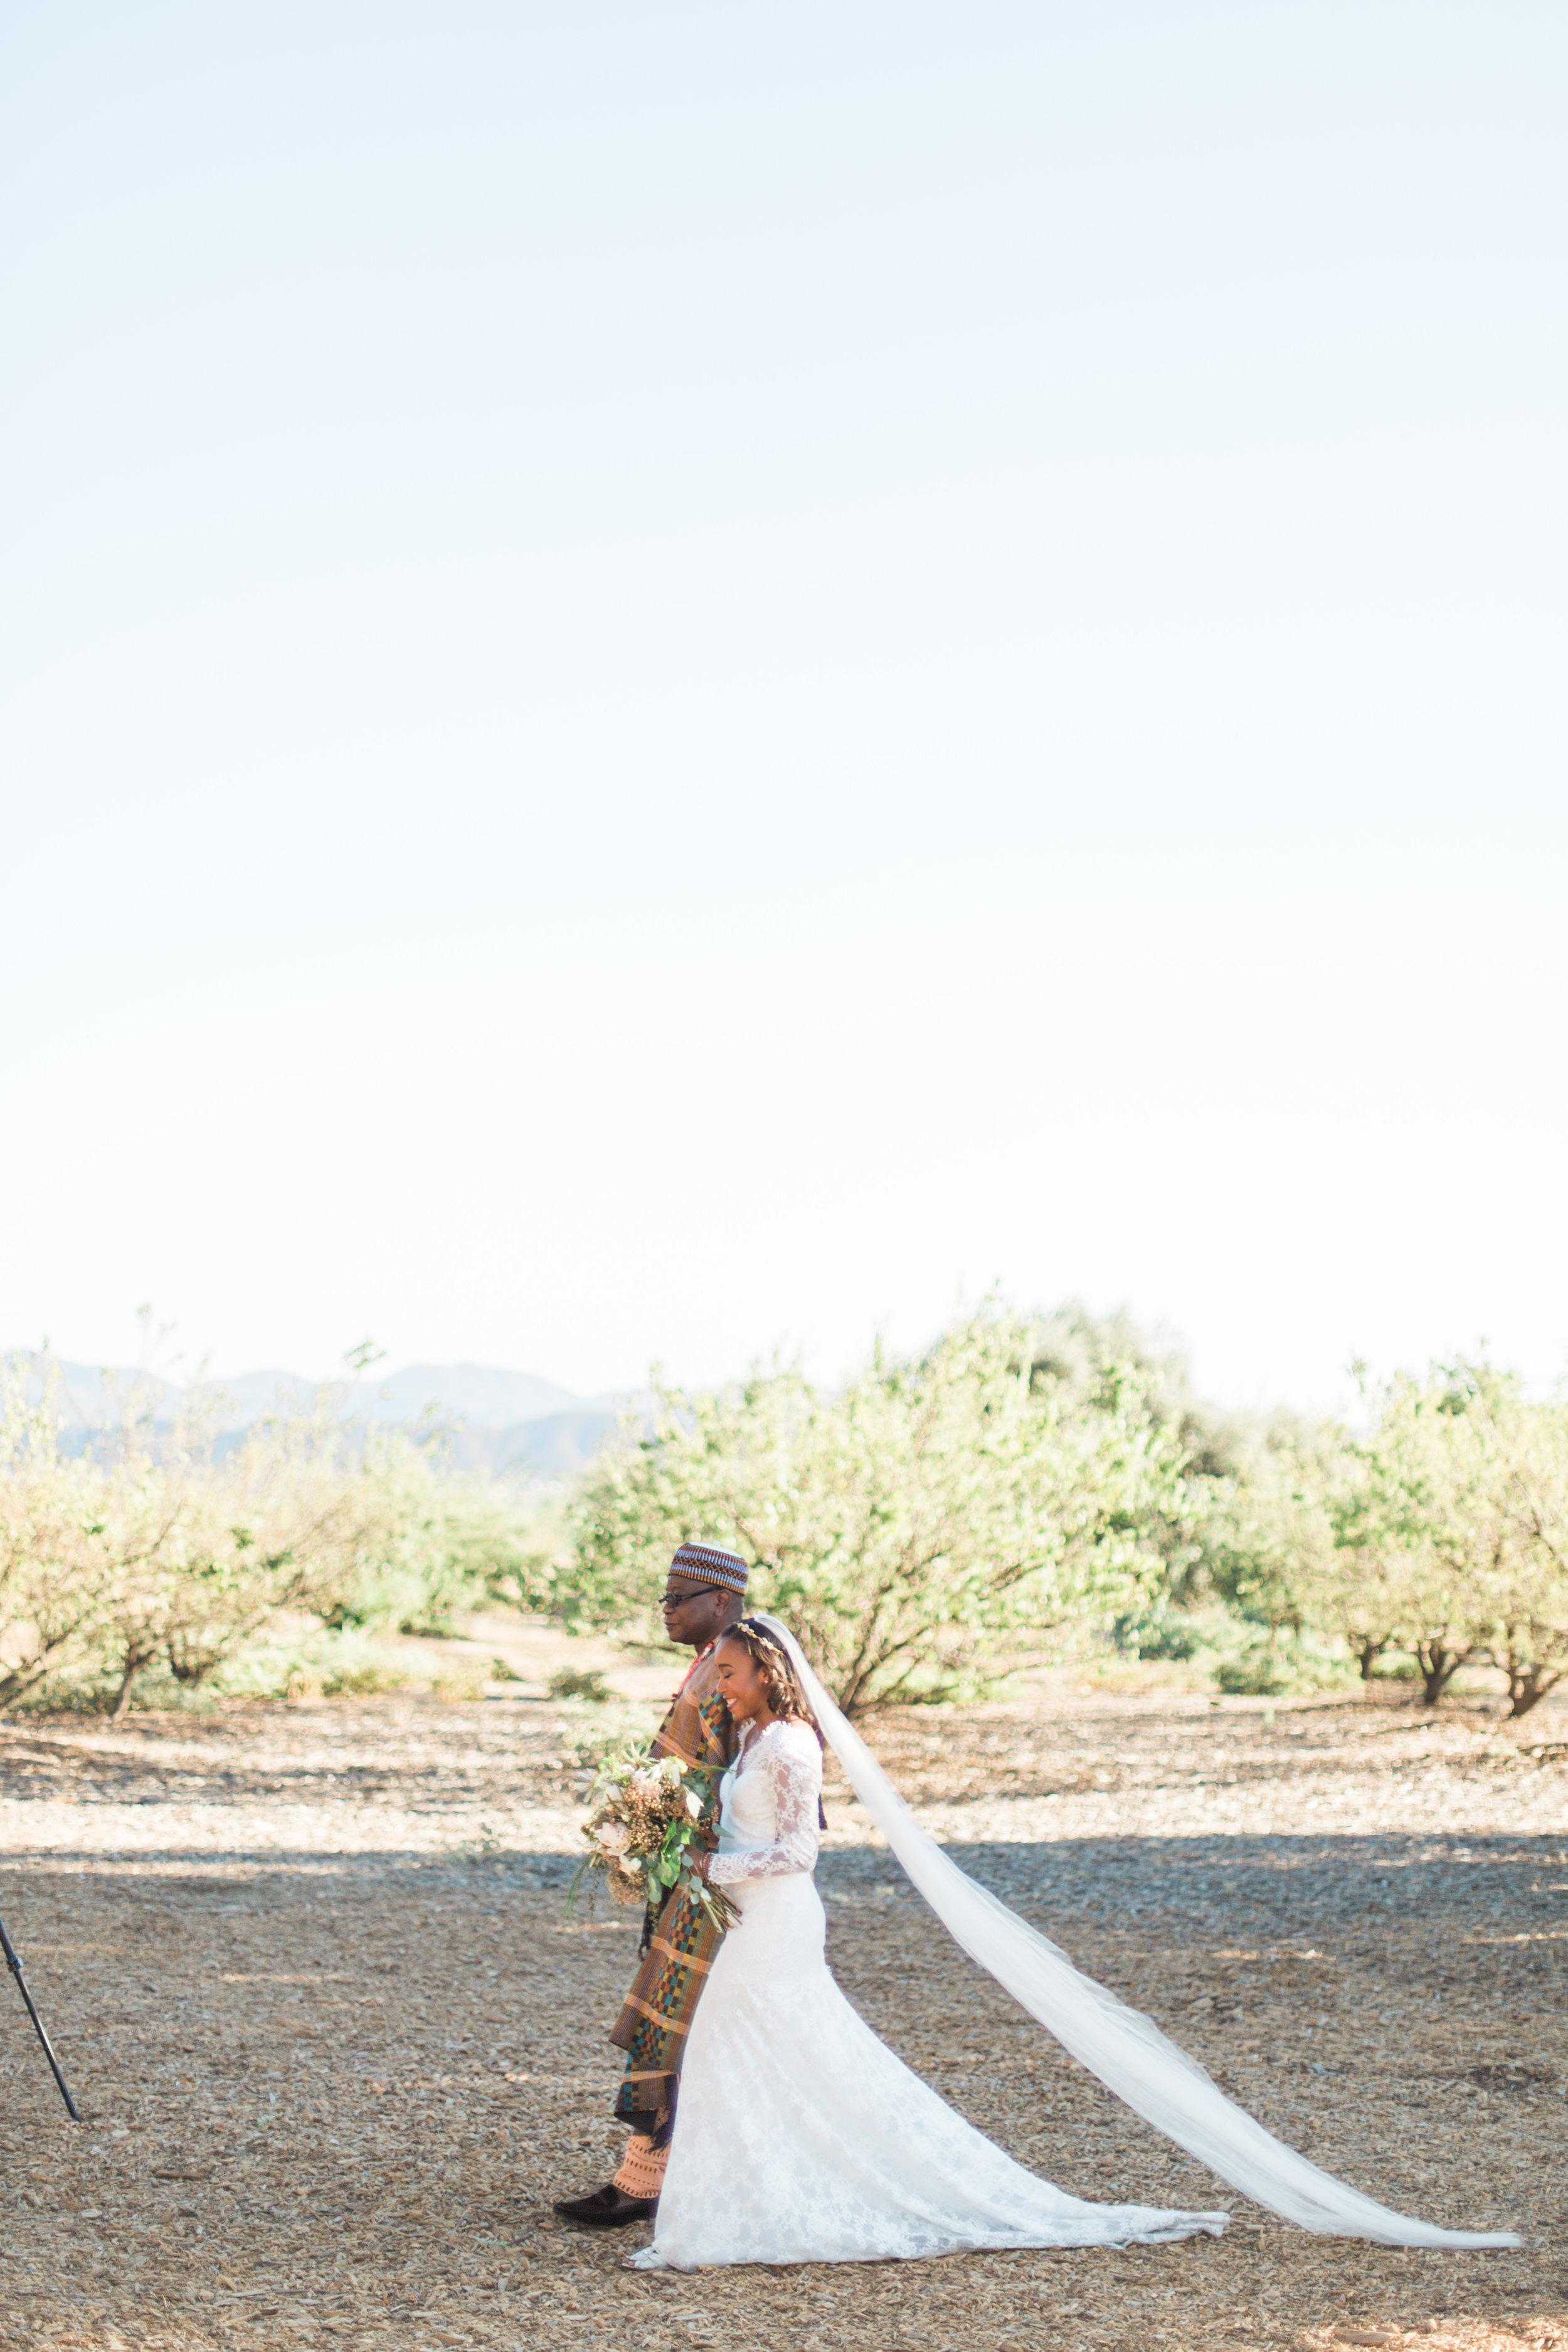 Jenny Quicksall Photography_www.jennyquicksall.com_California Wedding Photographer_Highland Springs Ranch and Inn Resort_Cherry Valley California (38).JPG